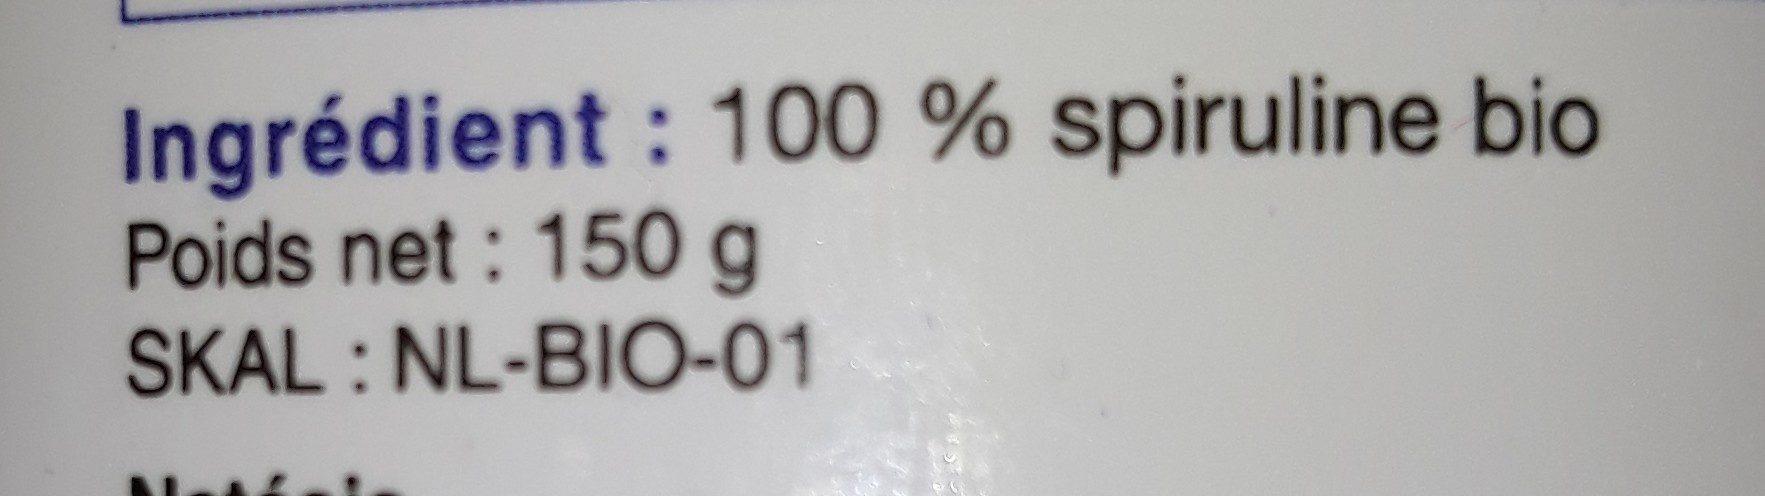 Spiruline Natésis Bio Certifiée bio 300 Comprimés 500 MG - 0.15KG - Ingredients - fr